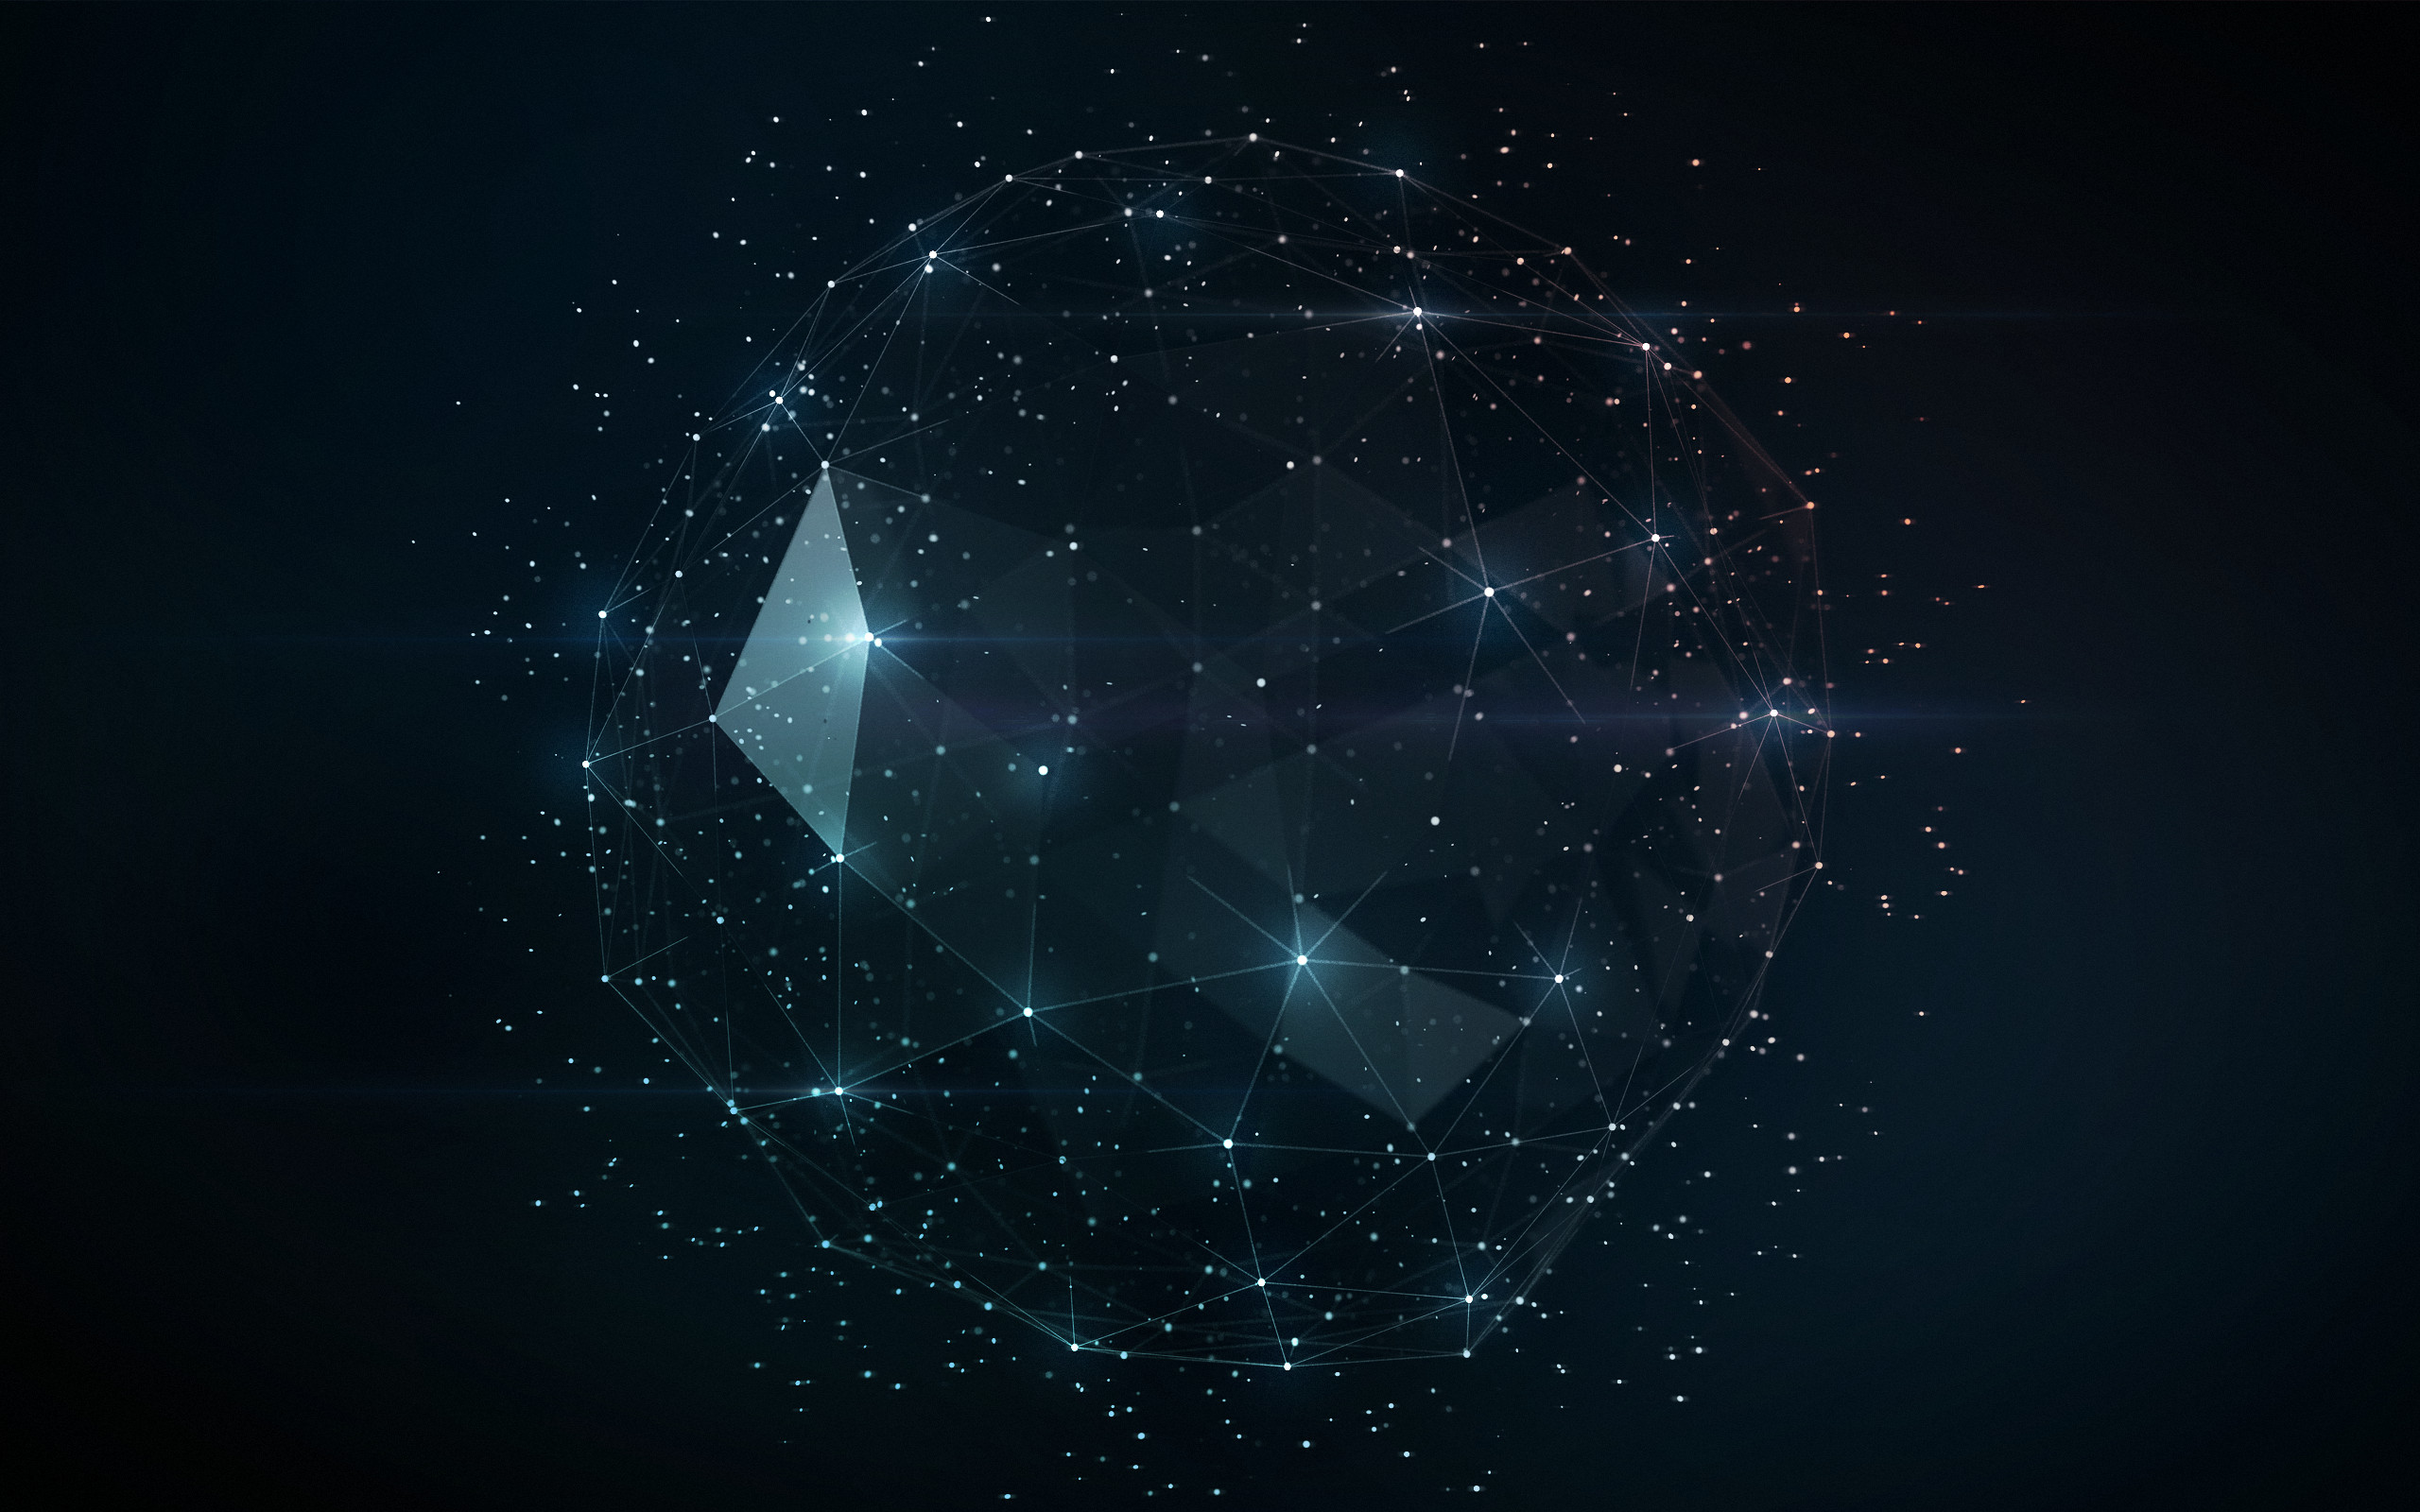 … web of stars wallpaper geometric shapes geometry sphere ball web …